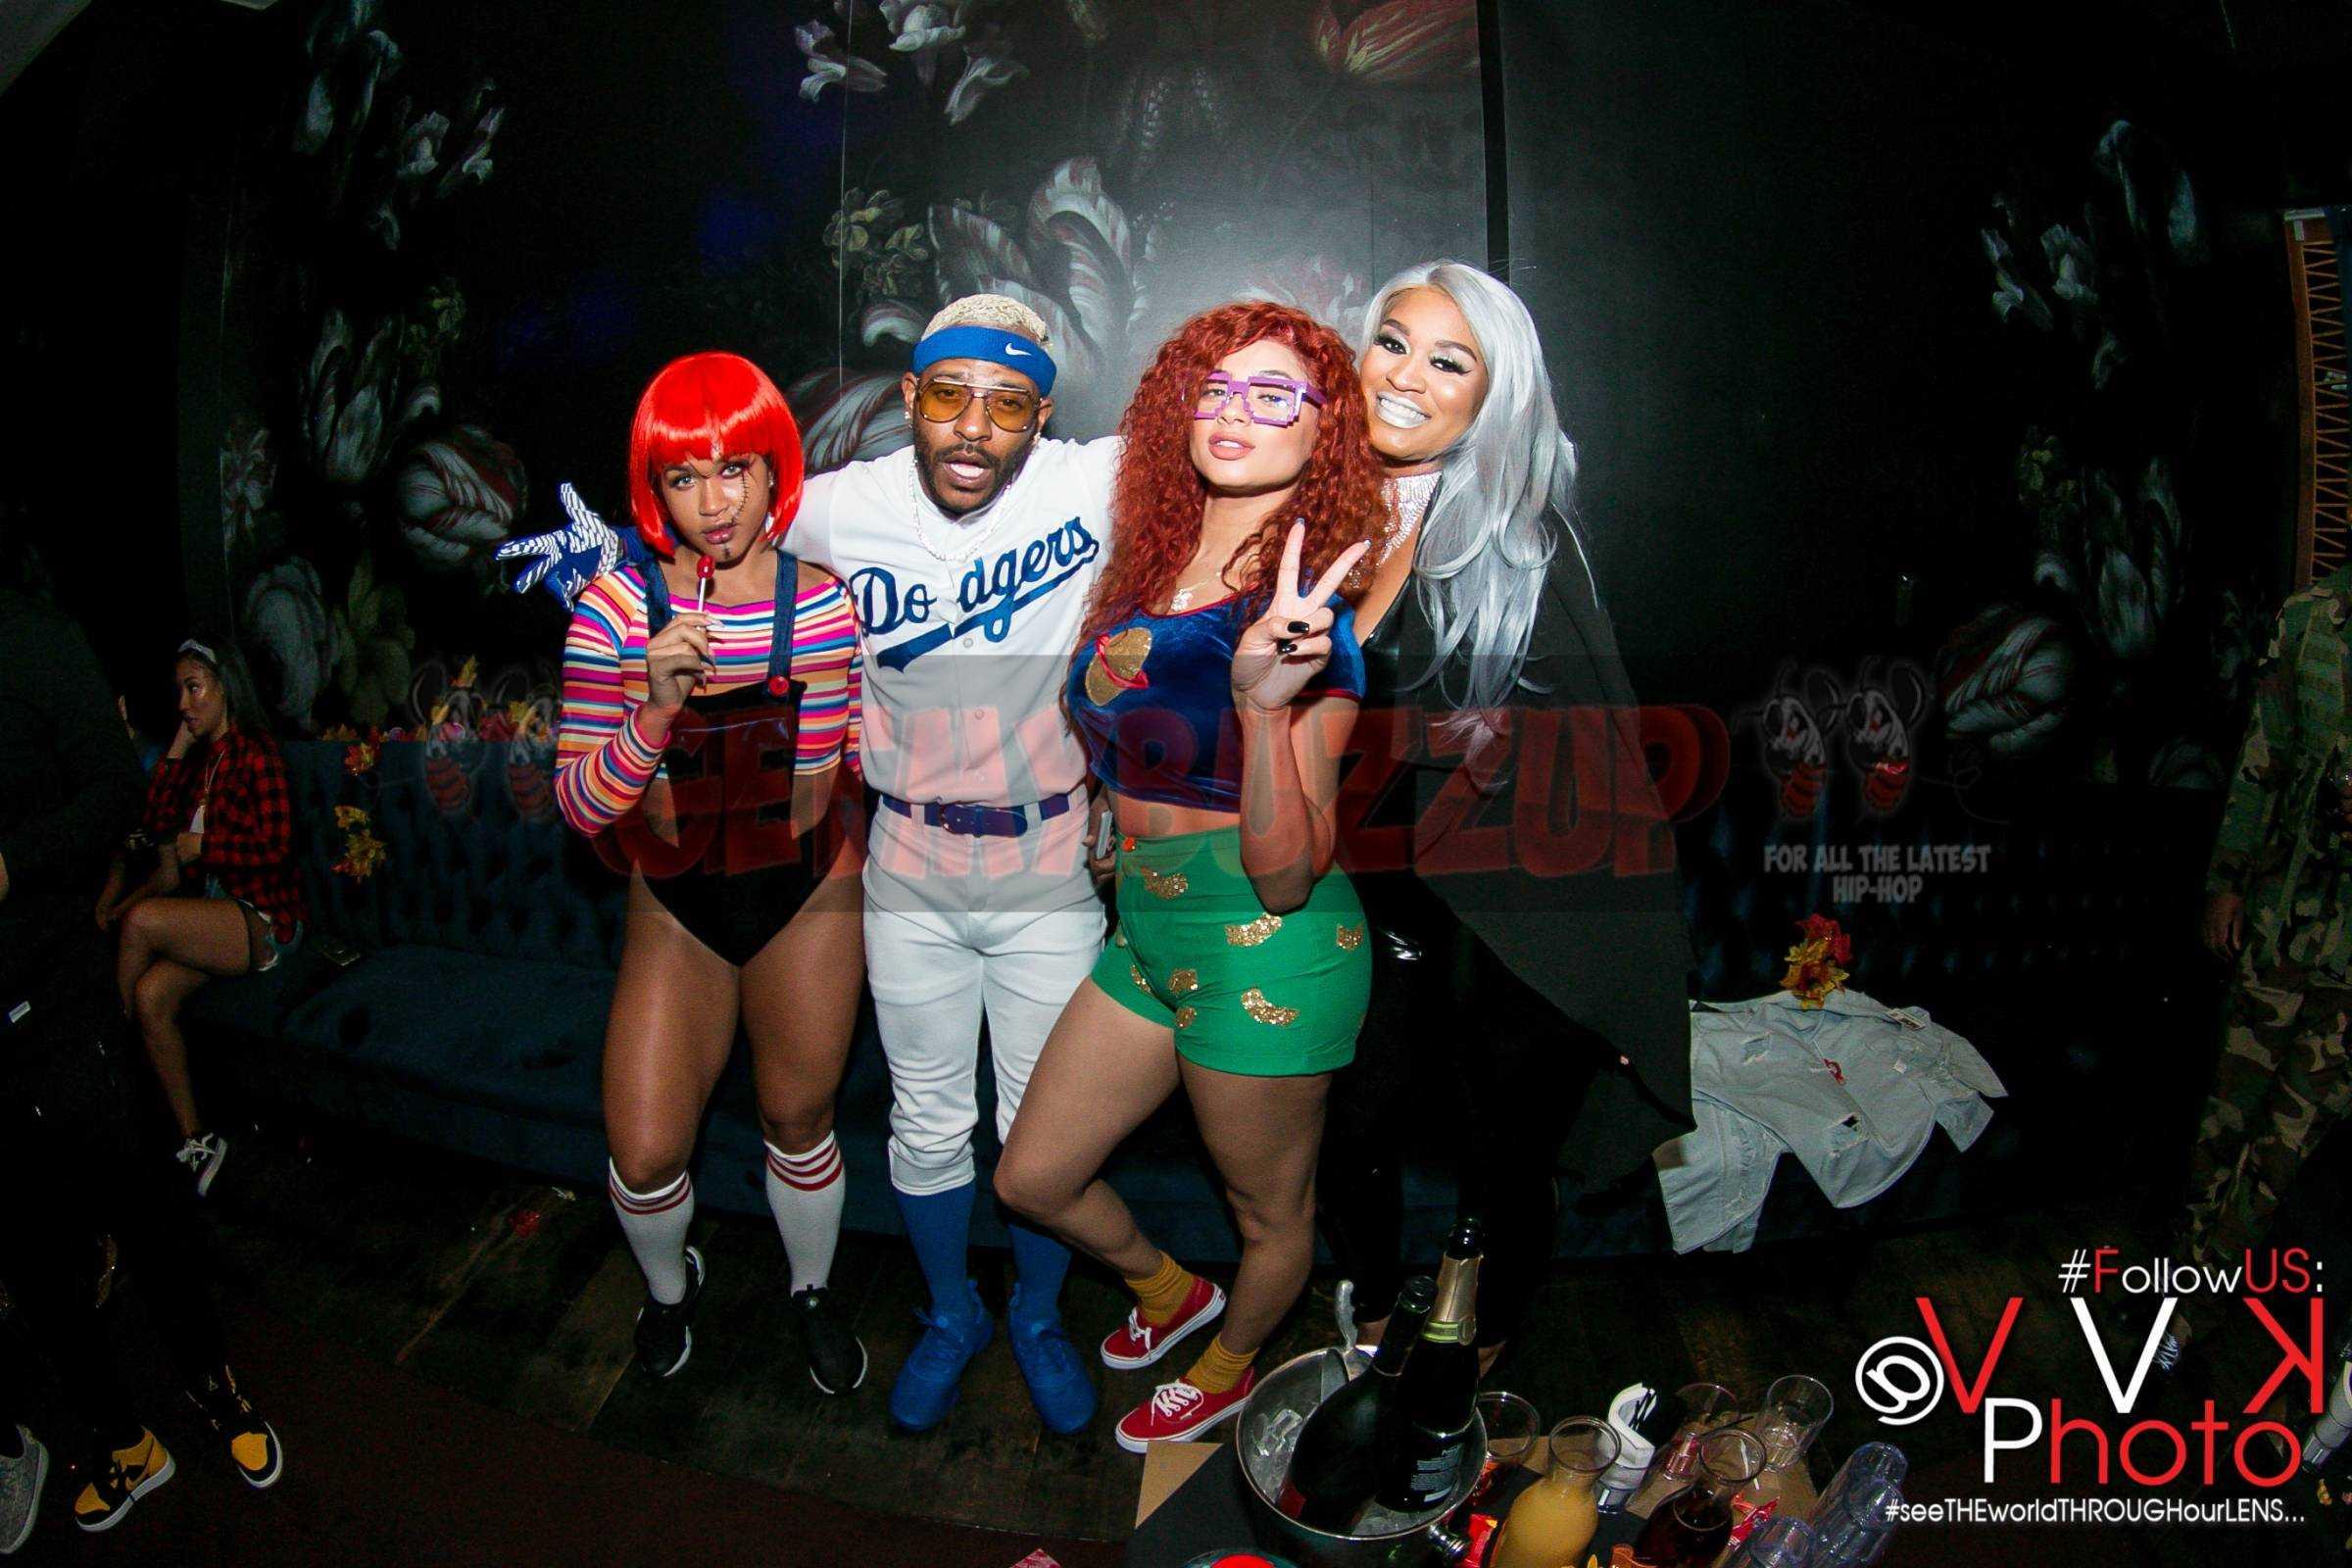 Laz Alonzo, Tori Brixx, Rah Ali, Rosa Acosta, Silento and More Celebrate Halloween